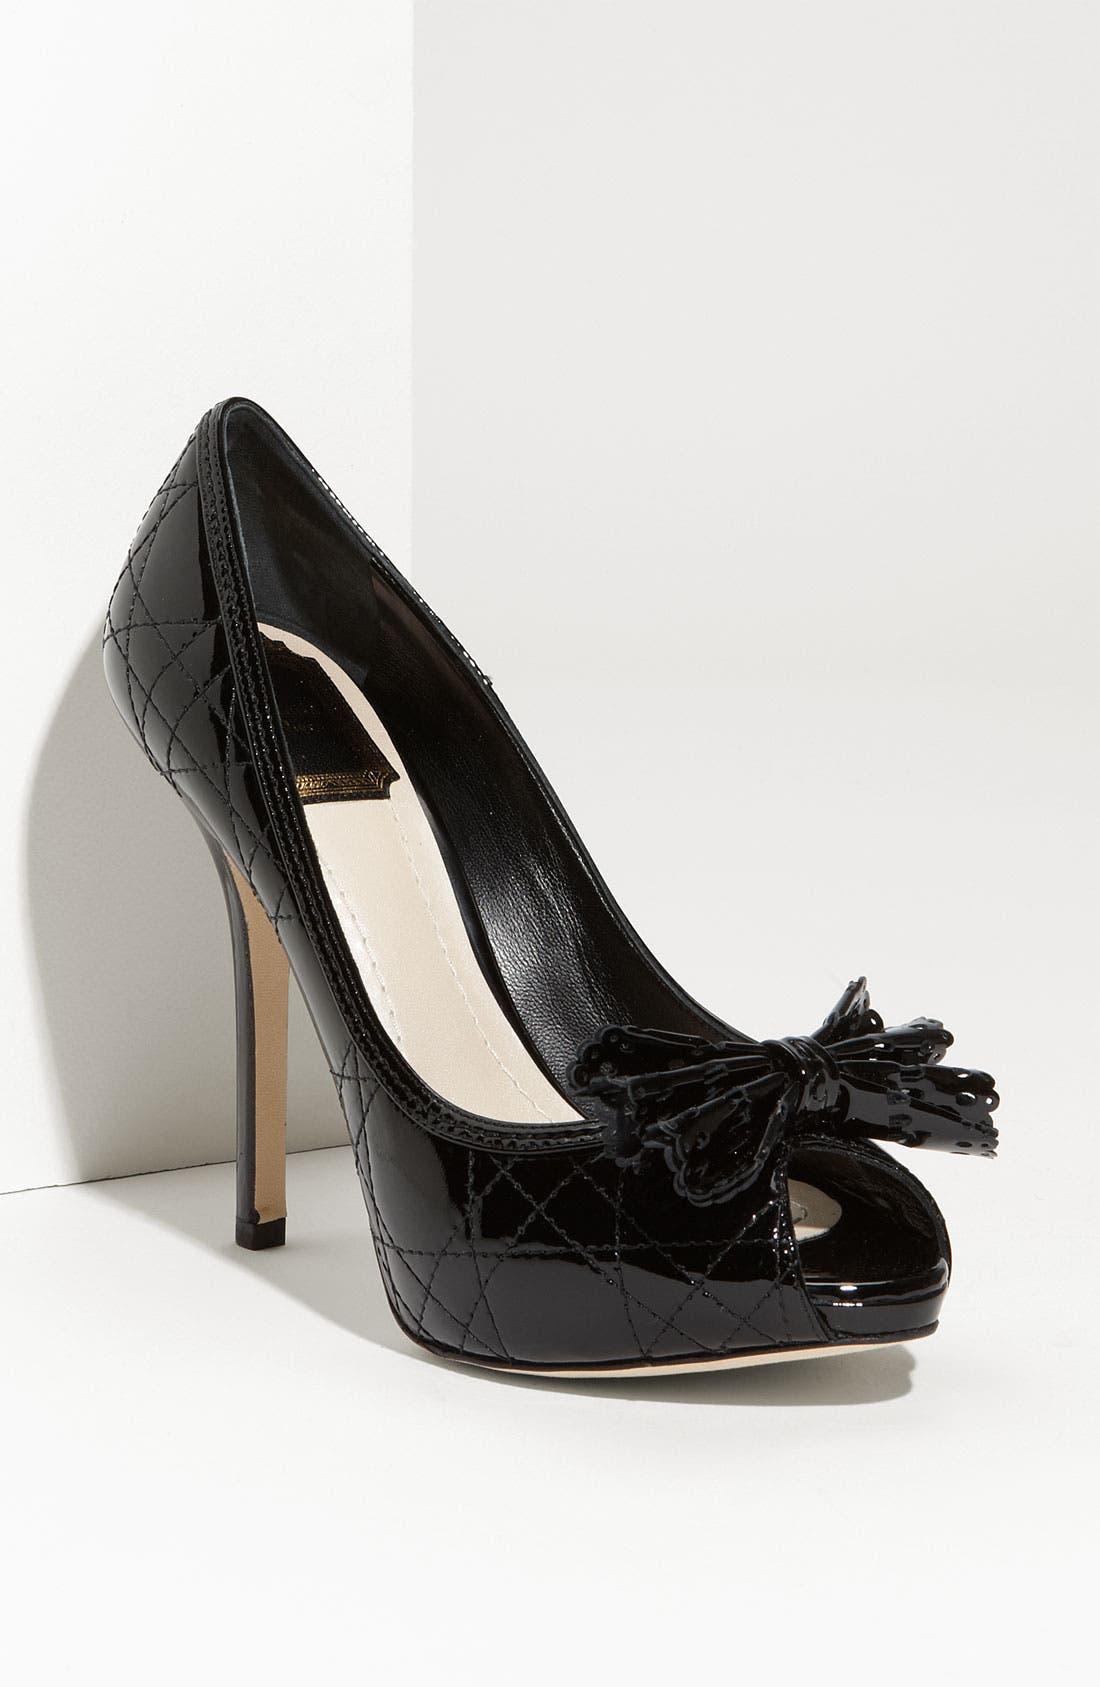 Main Image - Dior Cannage Stitch Peep Toe Pump